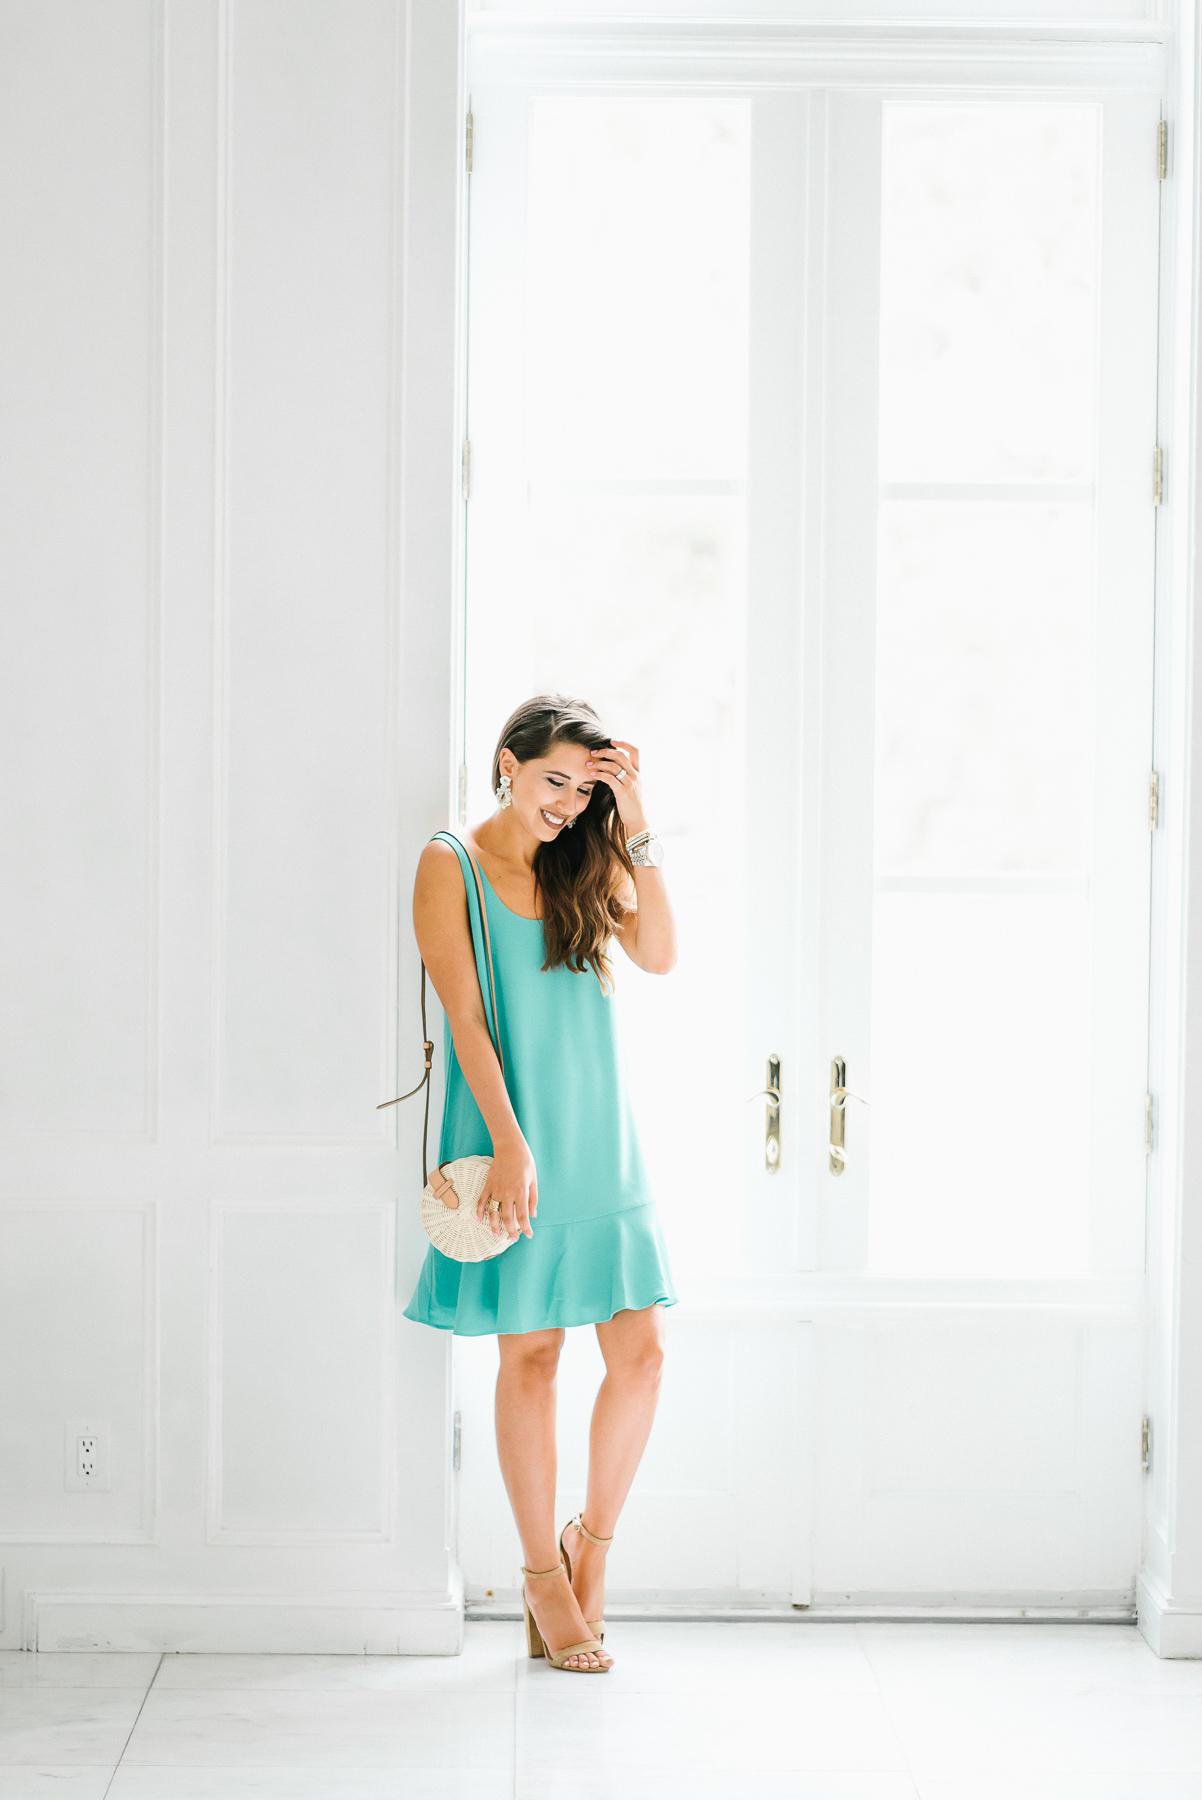 Dress Up Buttercup, Dede Raad, Houston Blogger, Fashion Blogger, Tank Dress